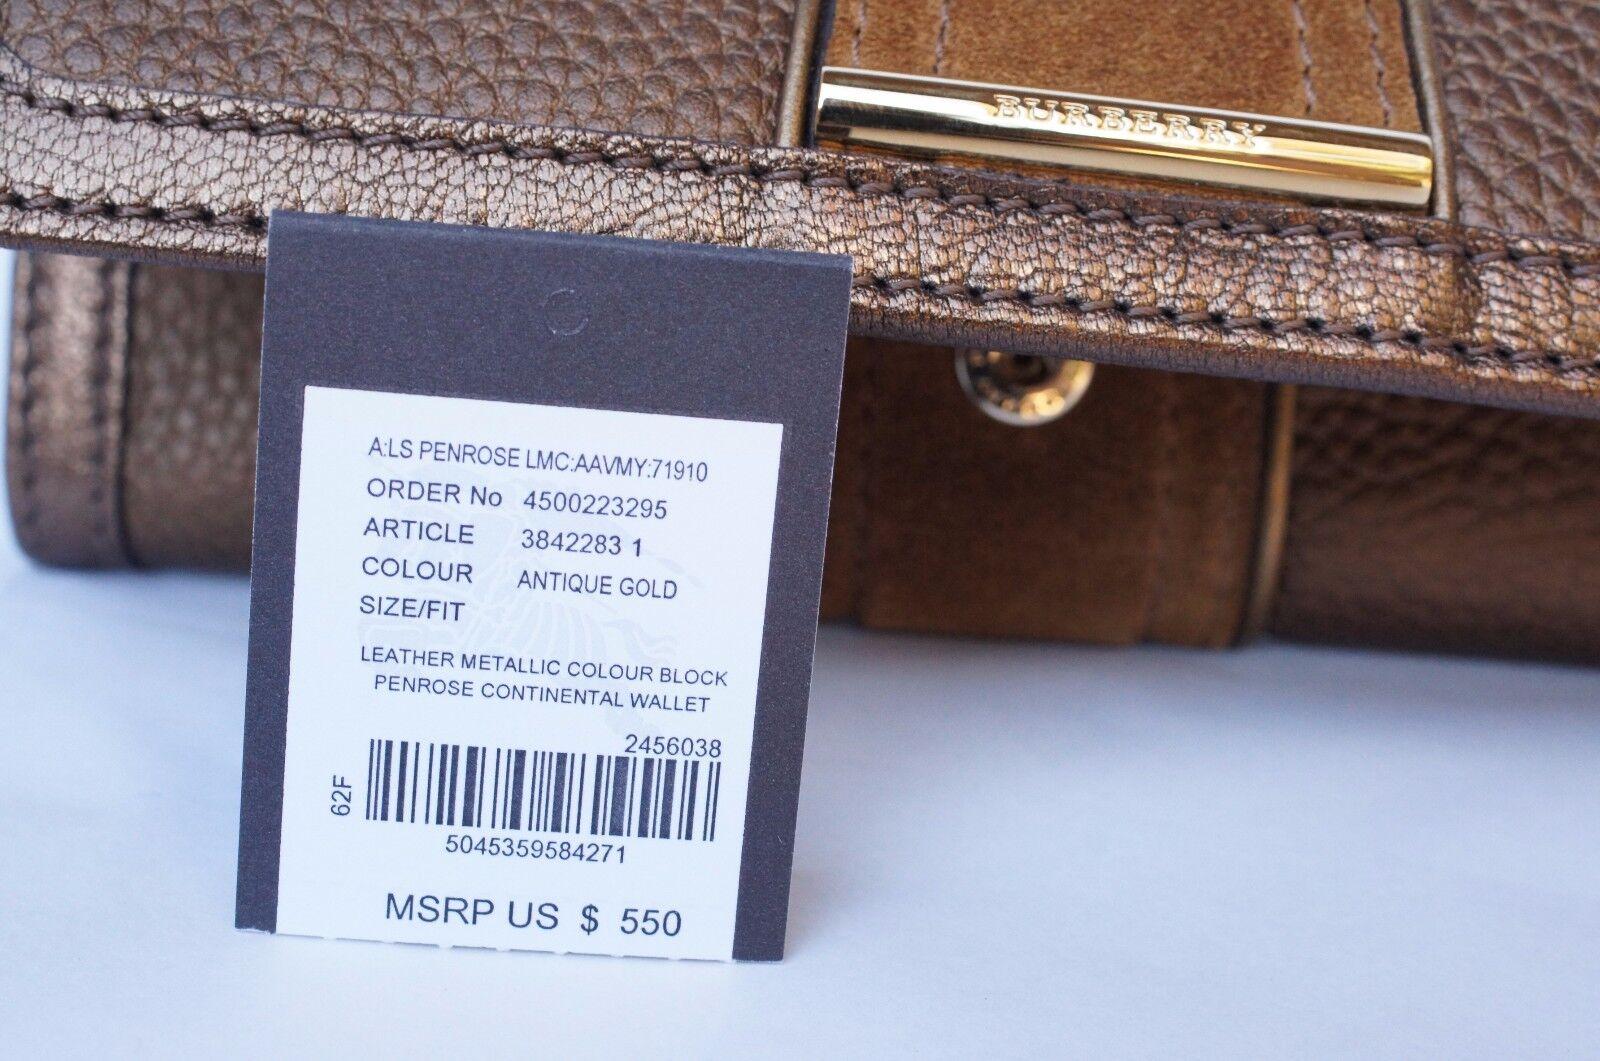 6bb62315c1a8 5045359584271 Burberry Wallet Colour Block Penrose CONTINENTAL Womens Bag  Handbag for sale online